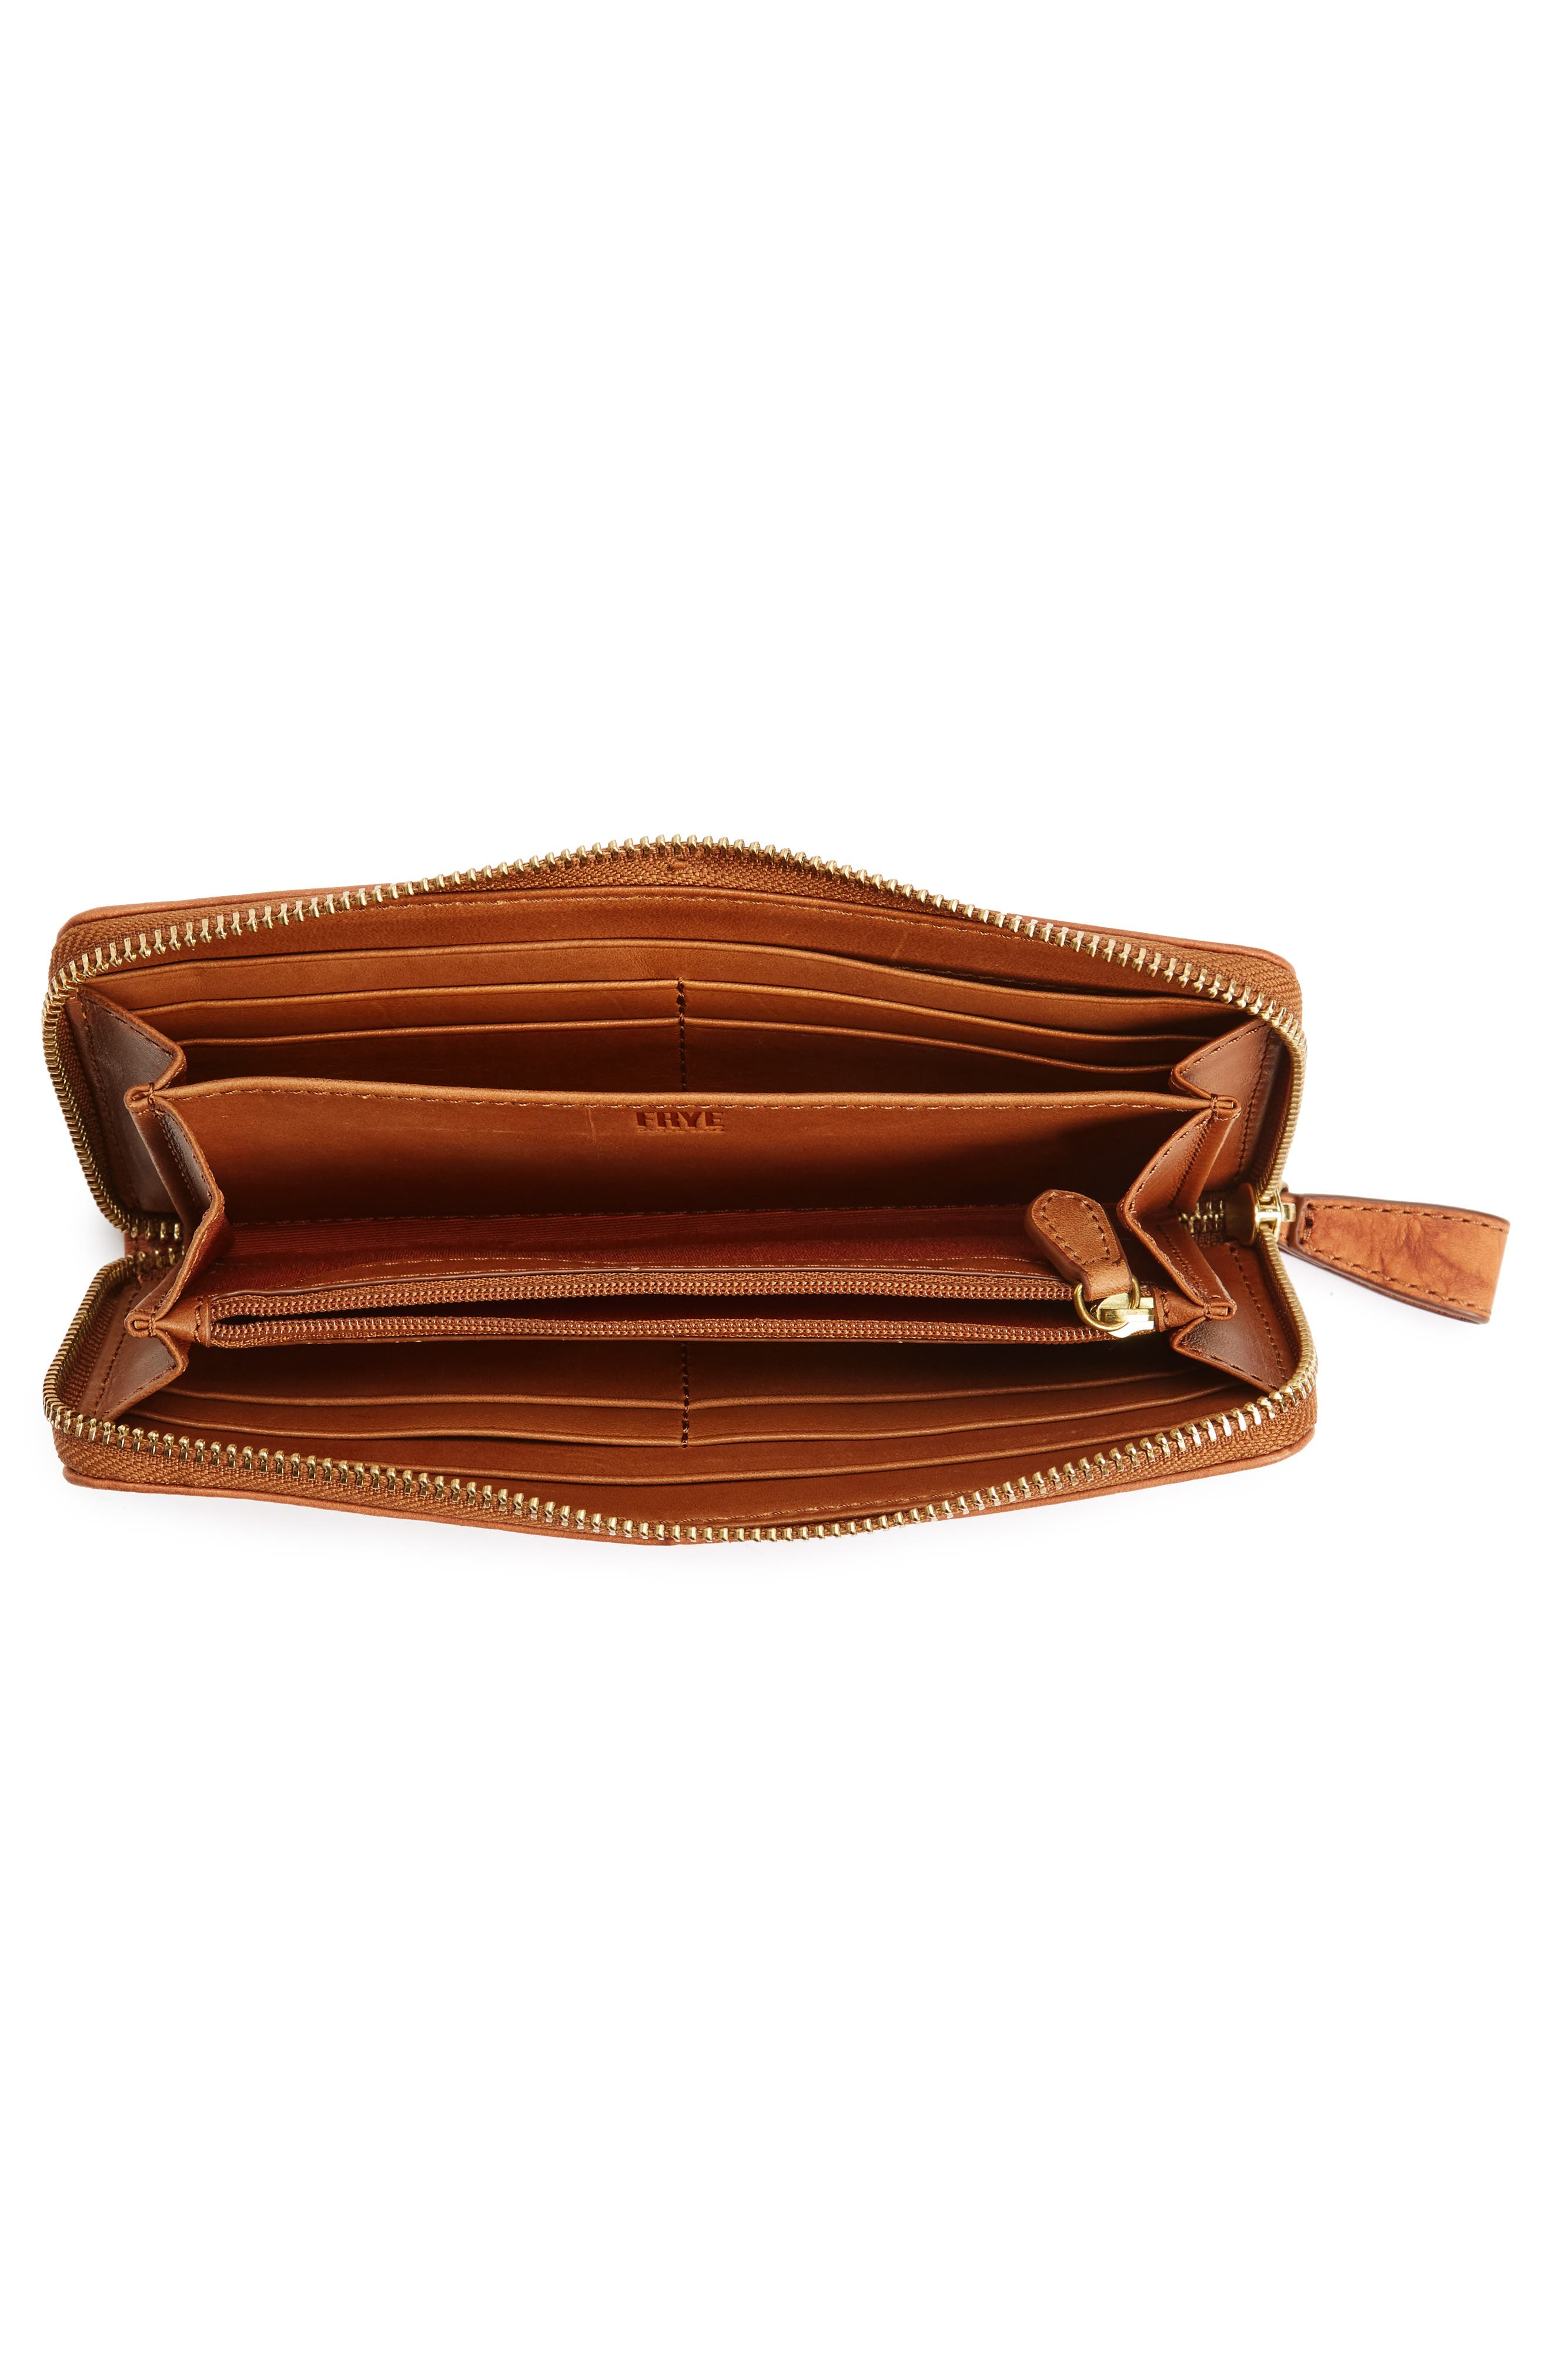 Campus Rivet Leather Continental Zip Wallet,                             Alternate thumbnail 11, color,